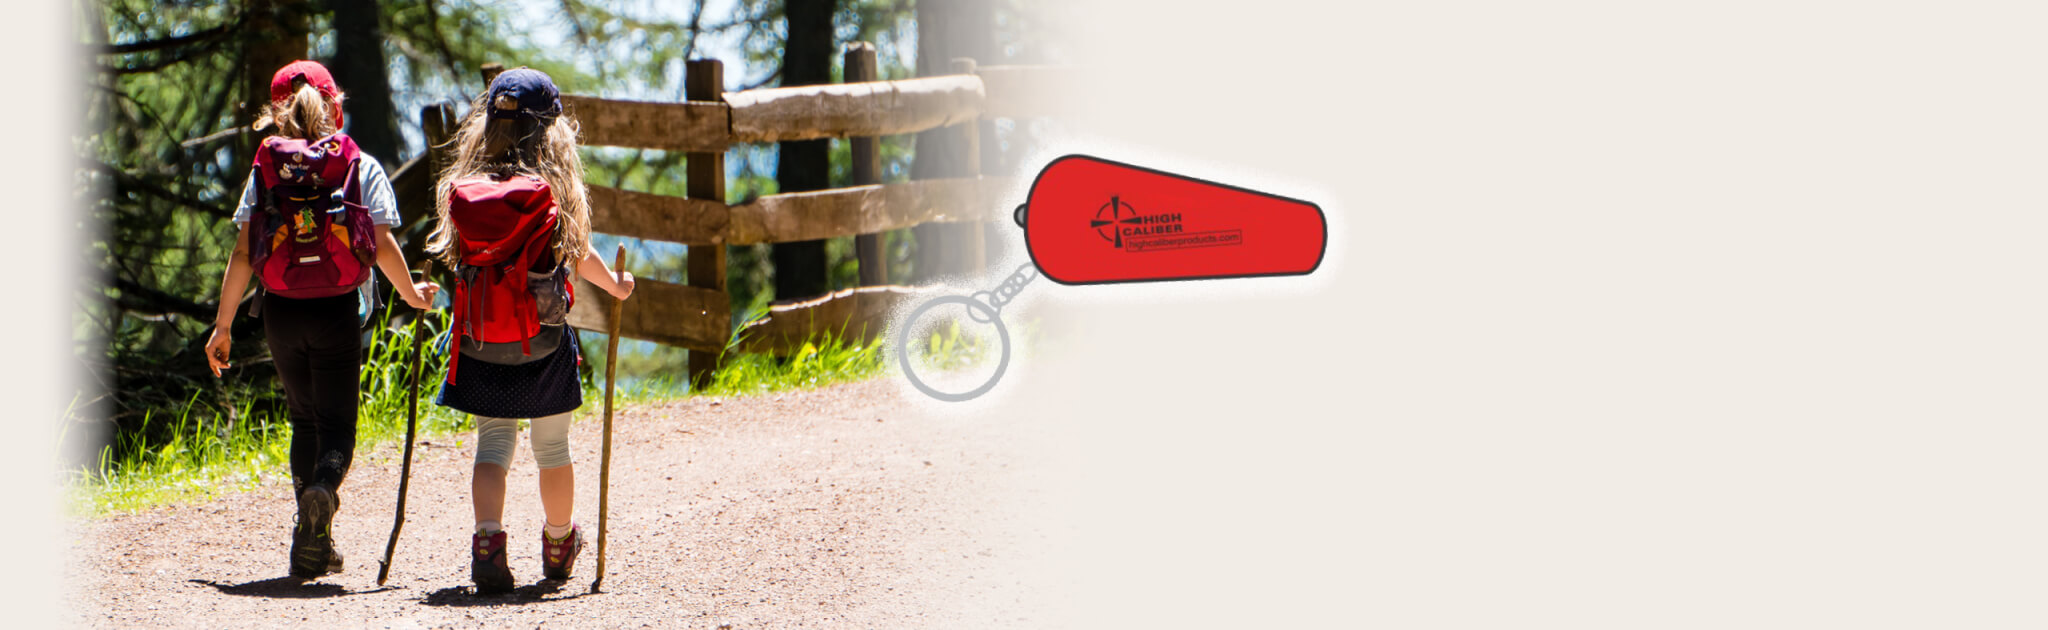 banner whistle keychain high caliber